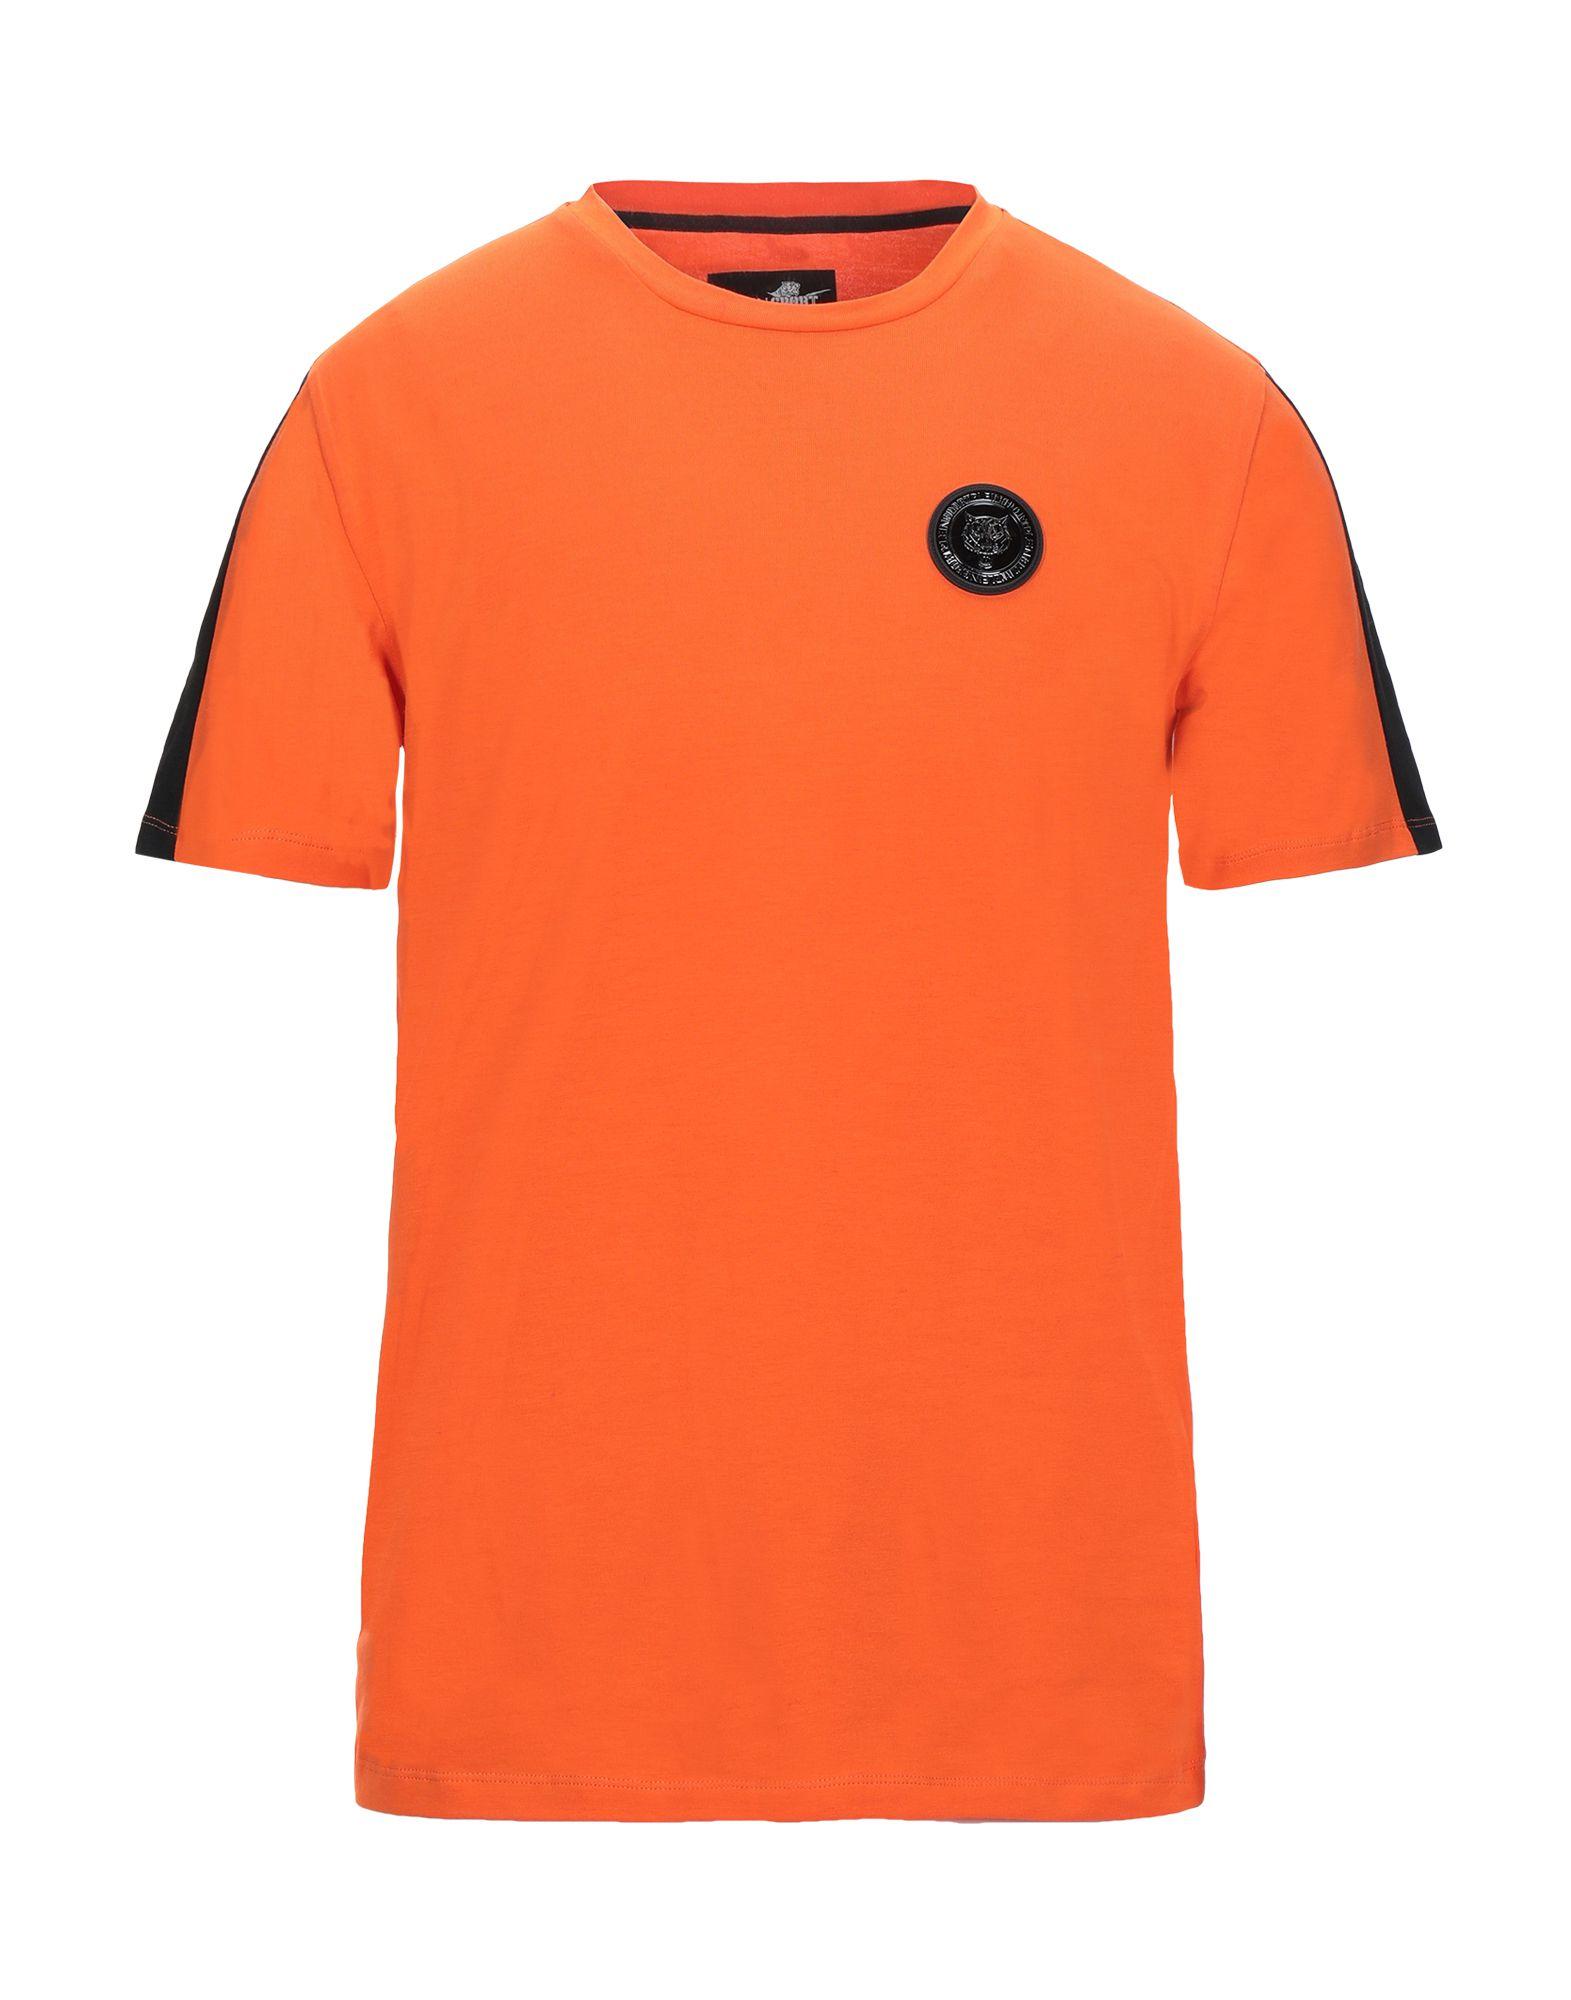 PLEIN SPORT プレイン・スポーツ メンズ T シャツ オレンジ